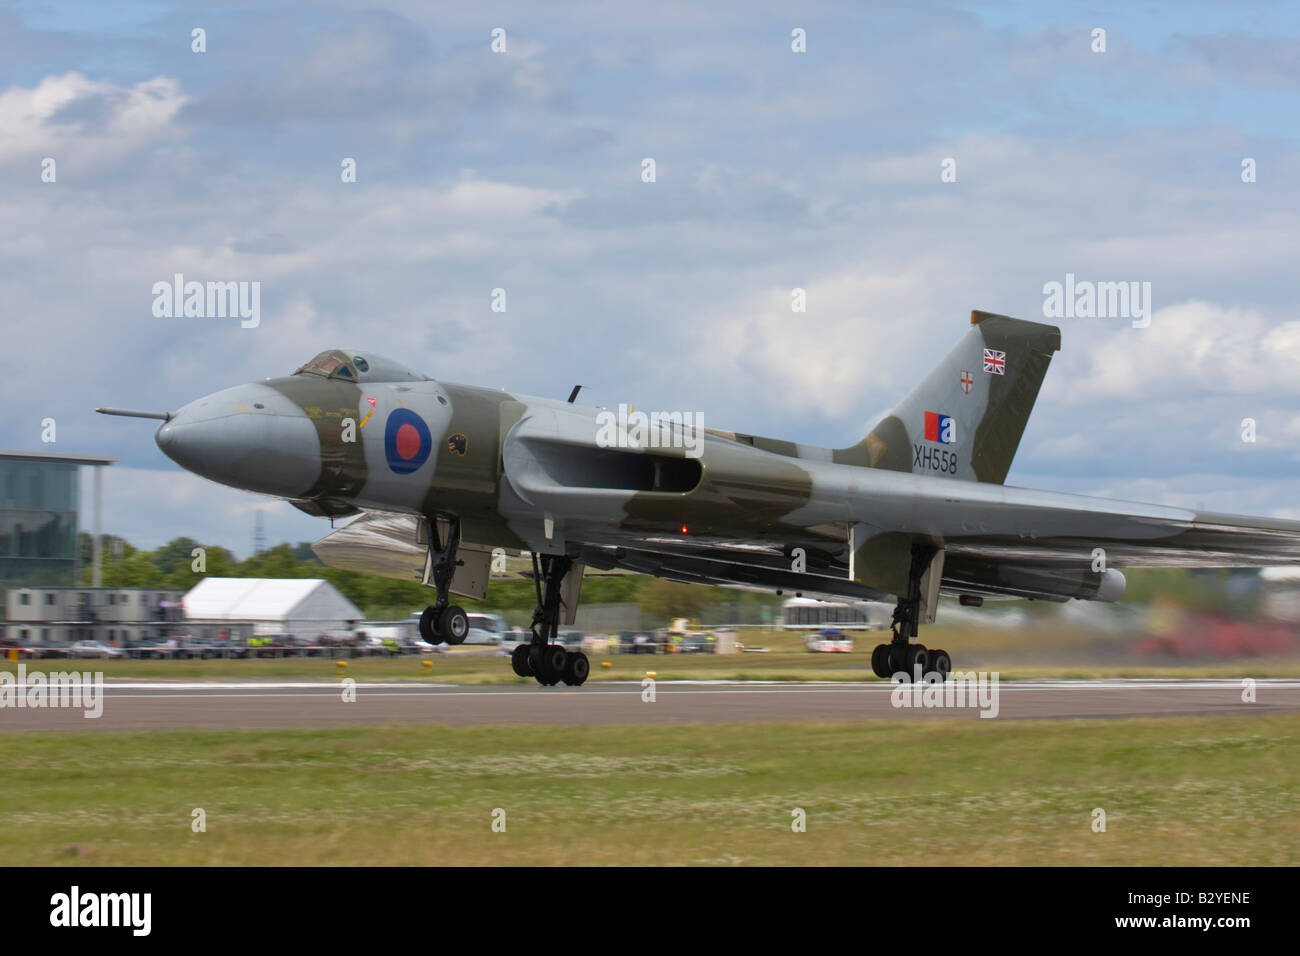 Avro Vulcan bomber taking off at Farnborough International Airshow 2008, England, United Kingdom. - Stock Image